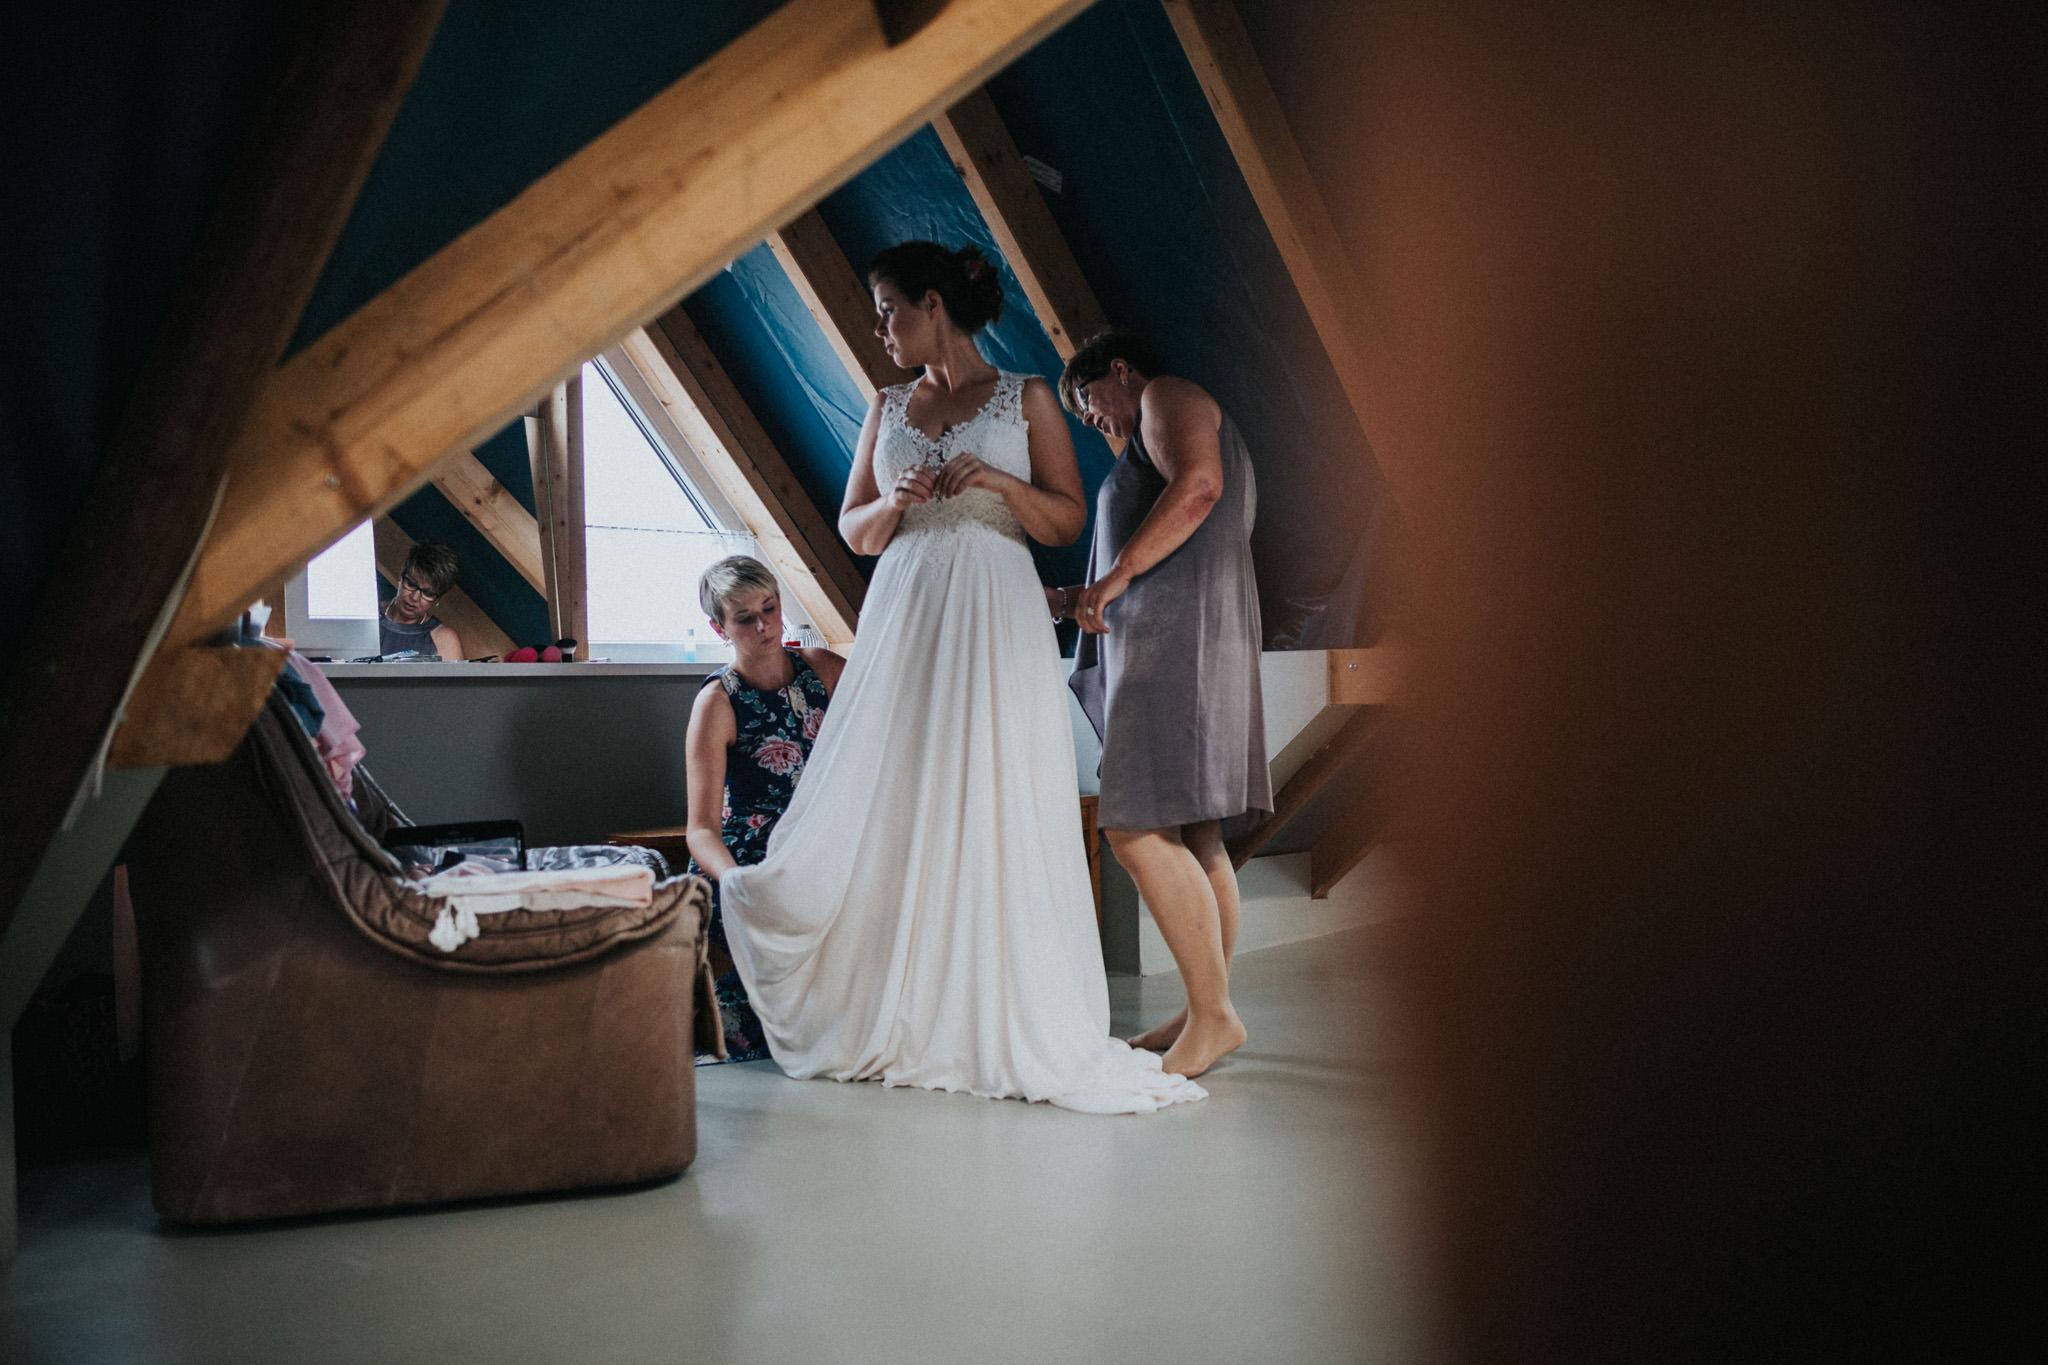 Hochzeitsfotograf-Homberg-18.jpg